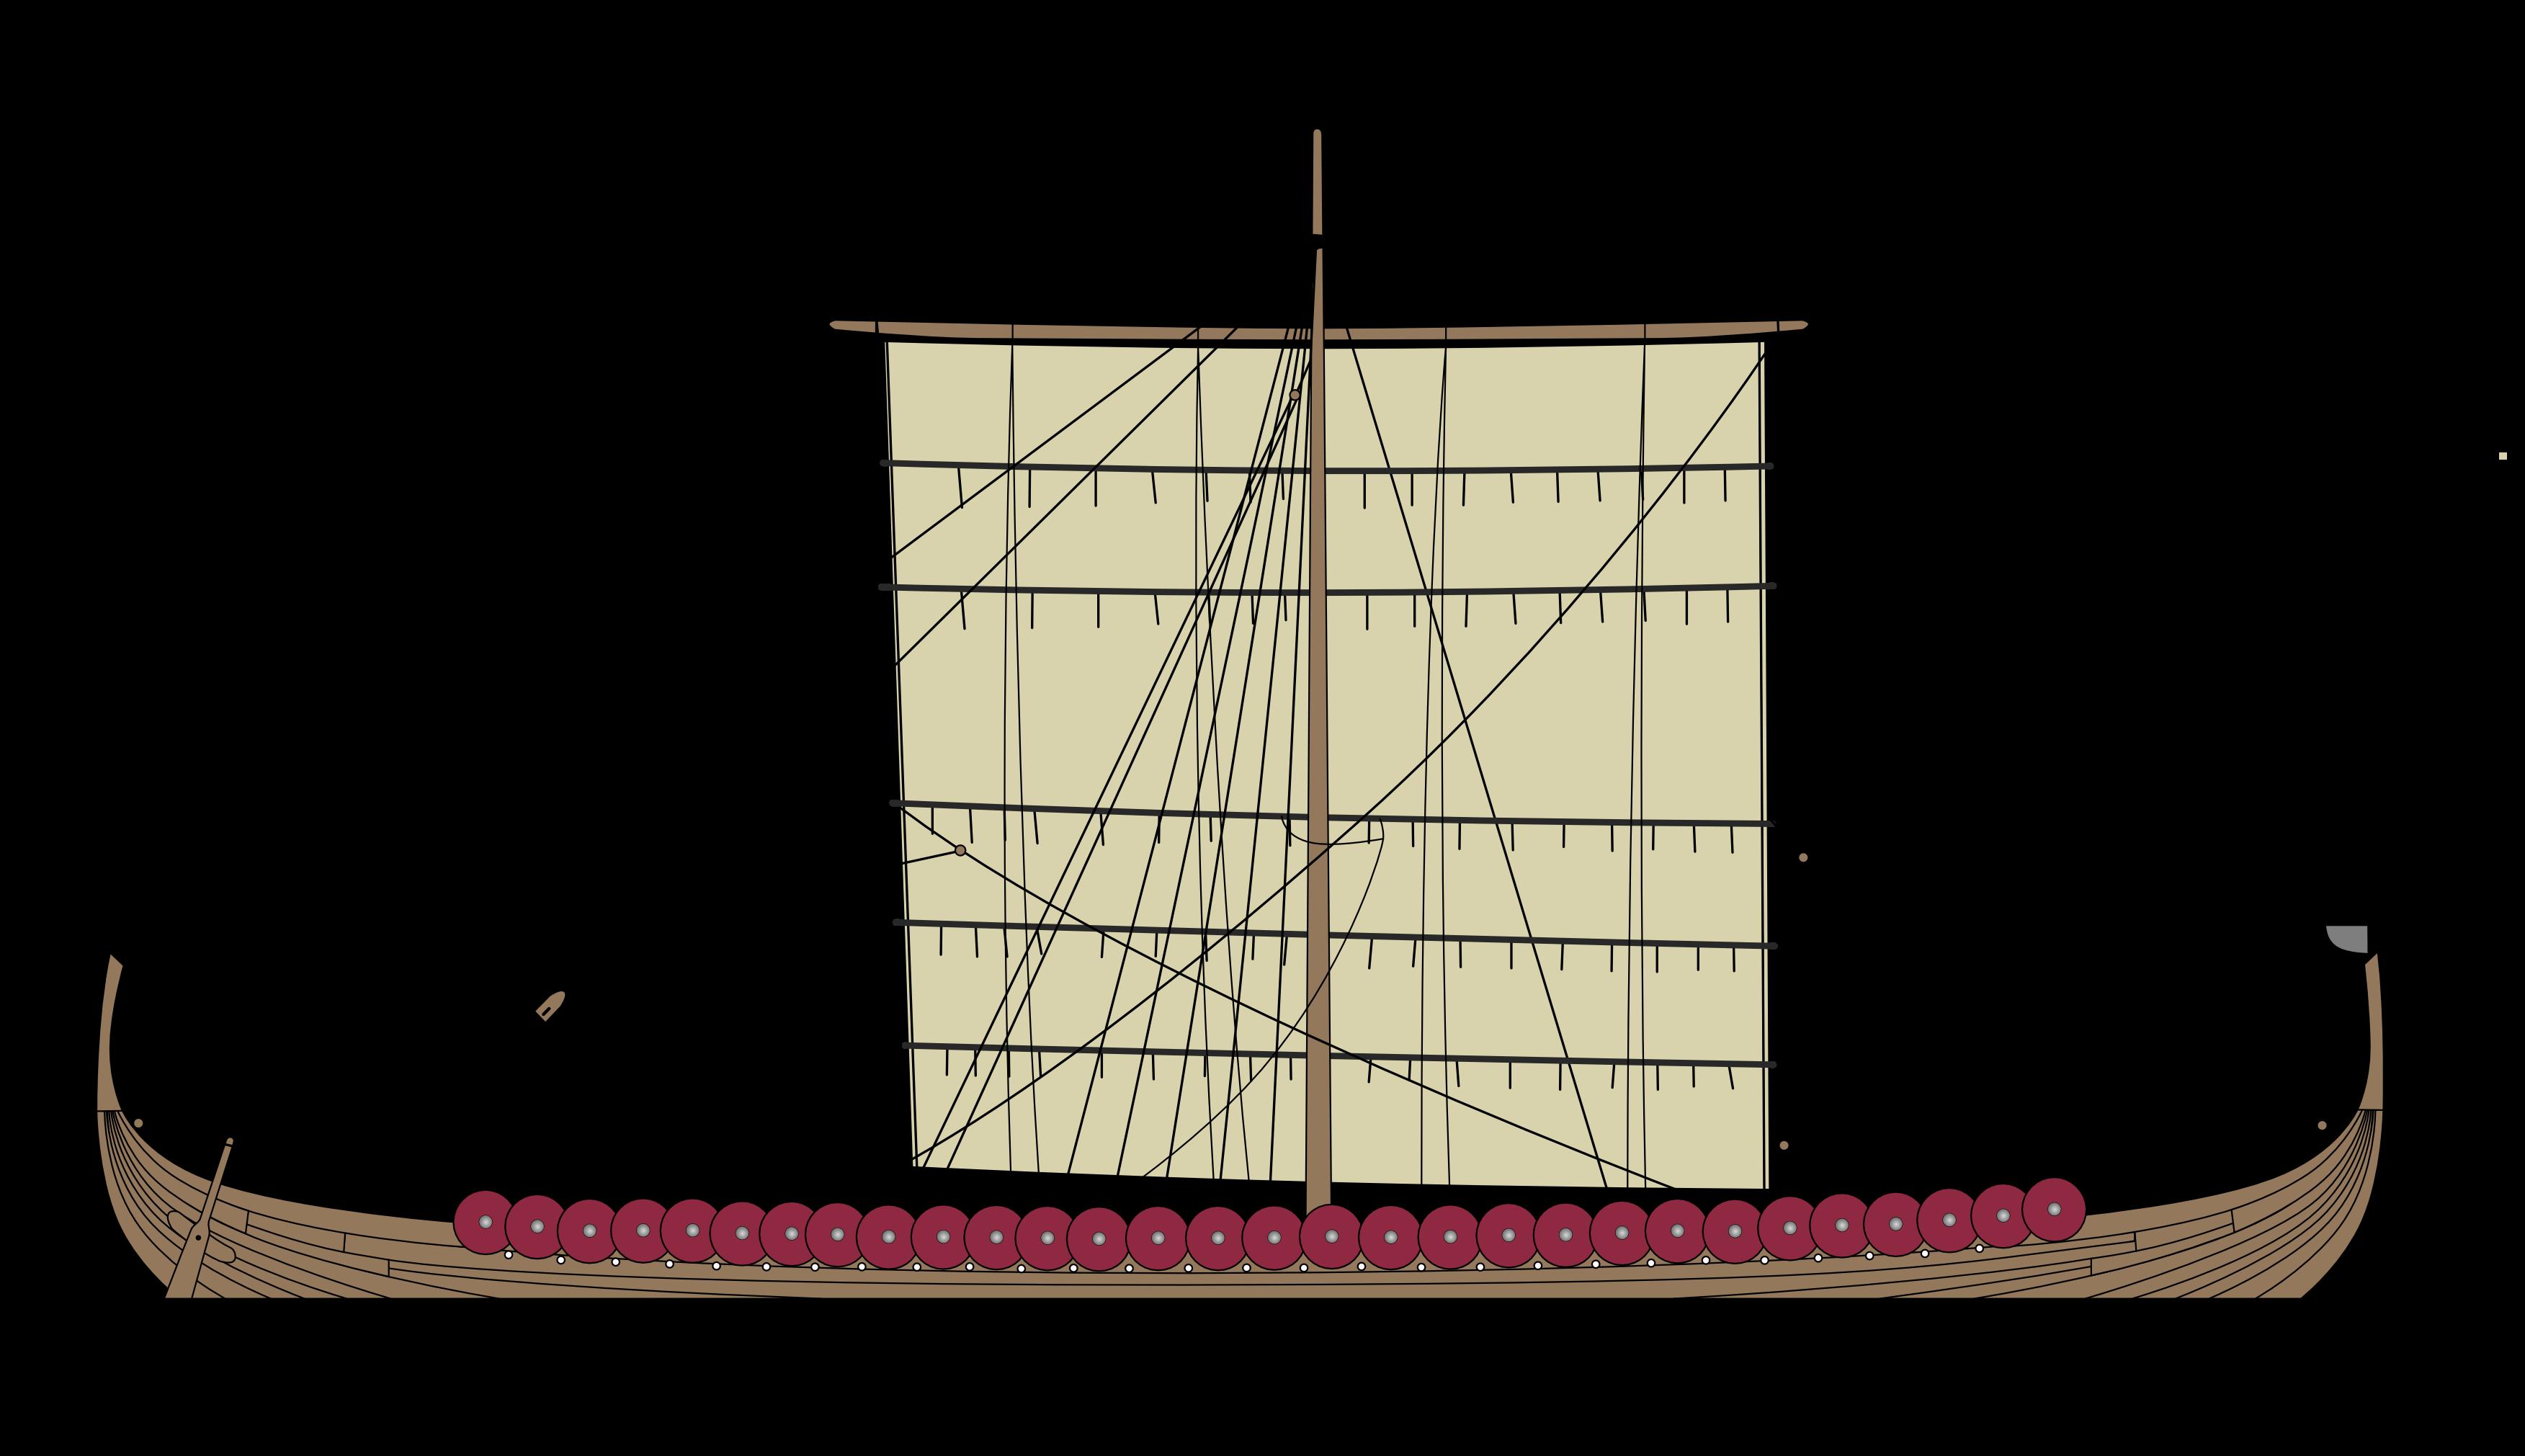 Viking ship on land clipart jpg freeuse Longship - Wikipedia jpg freeuse